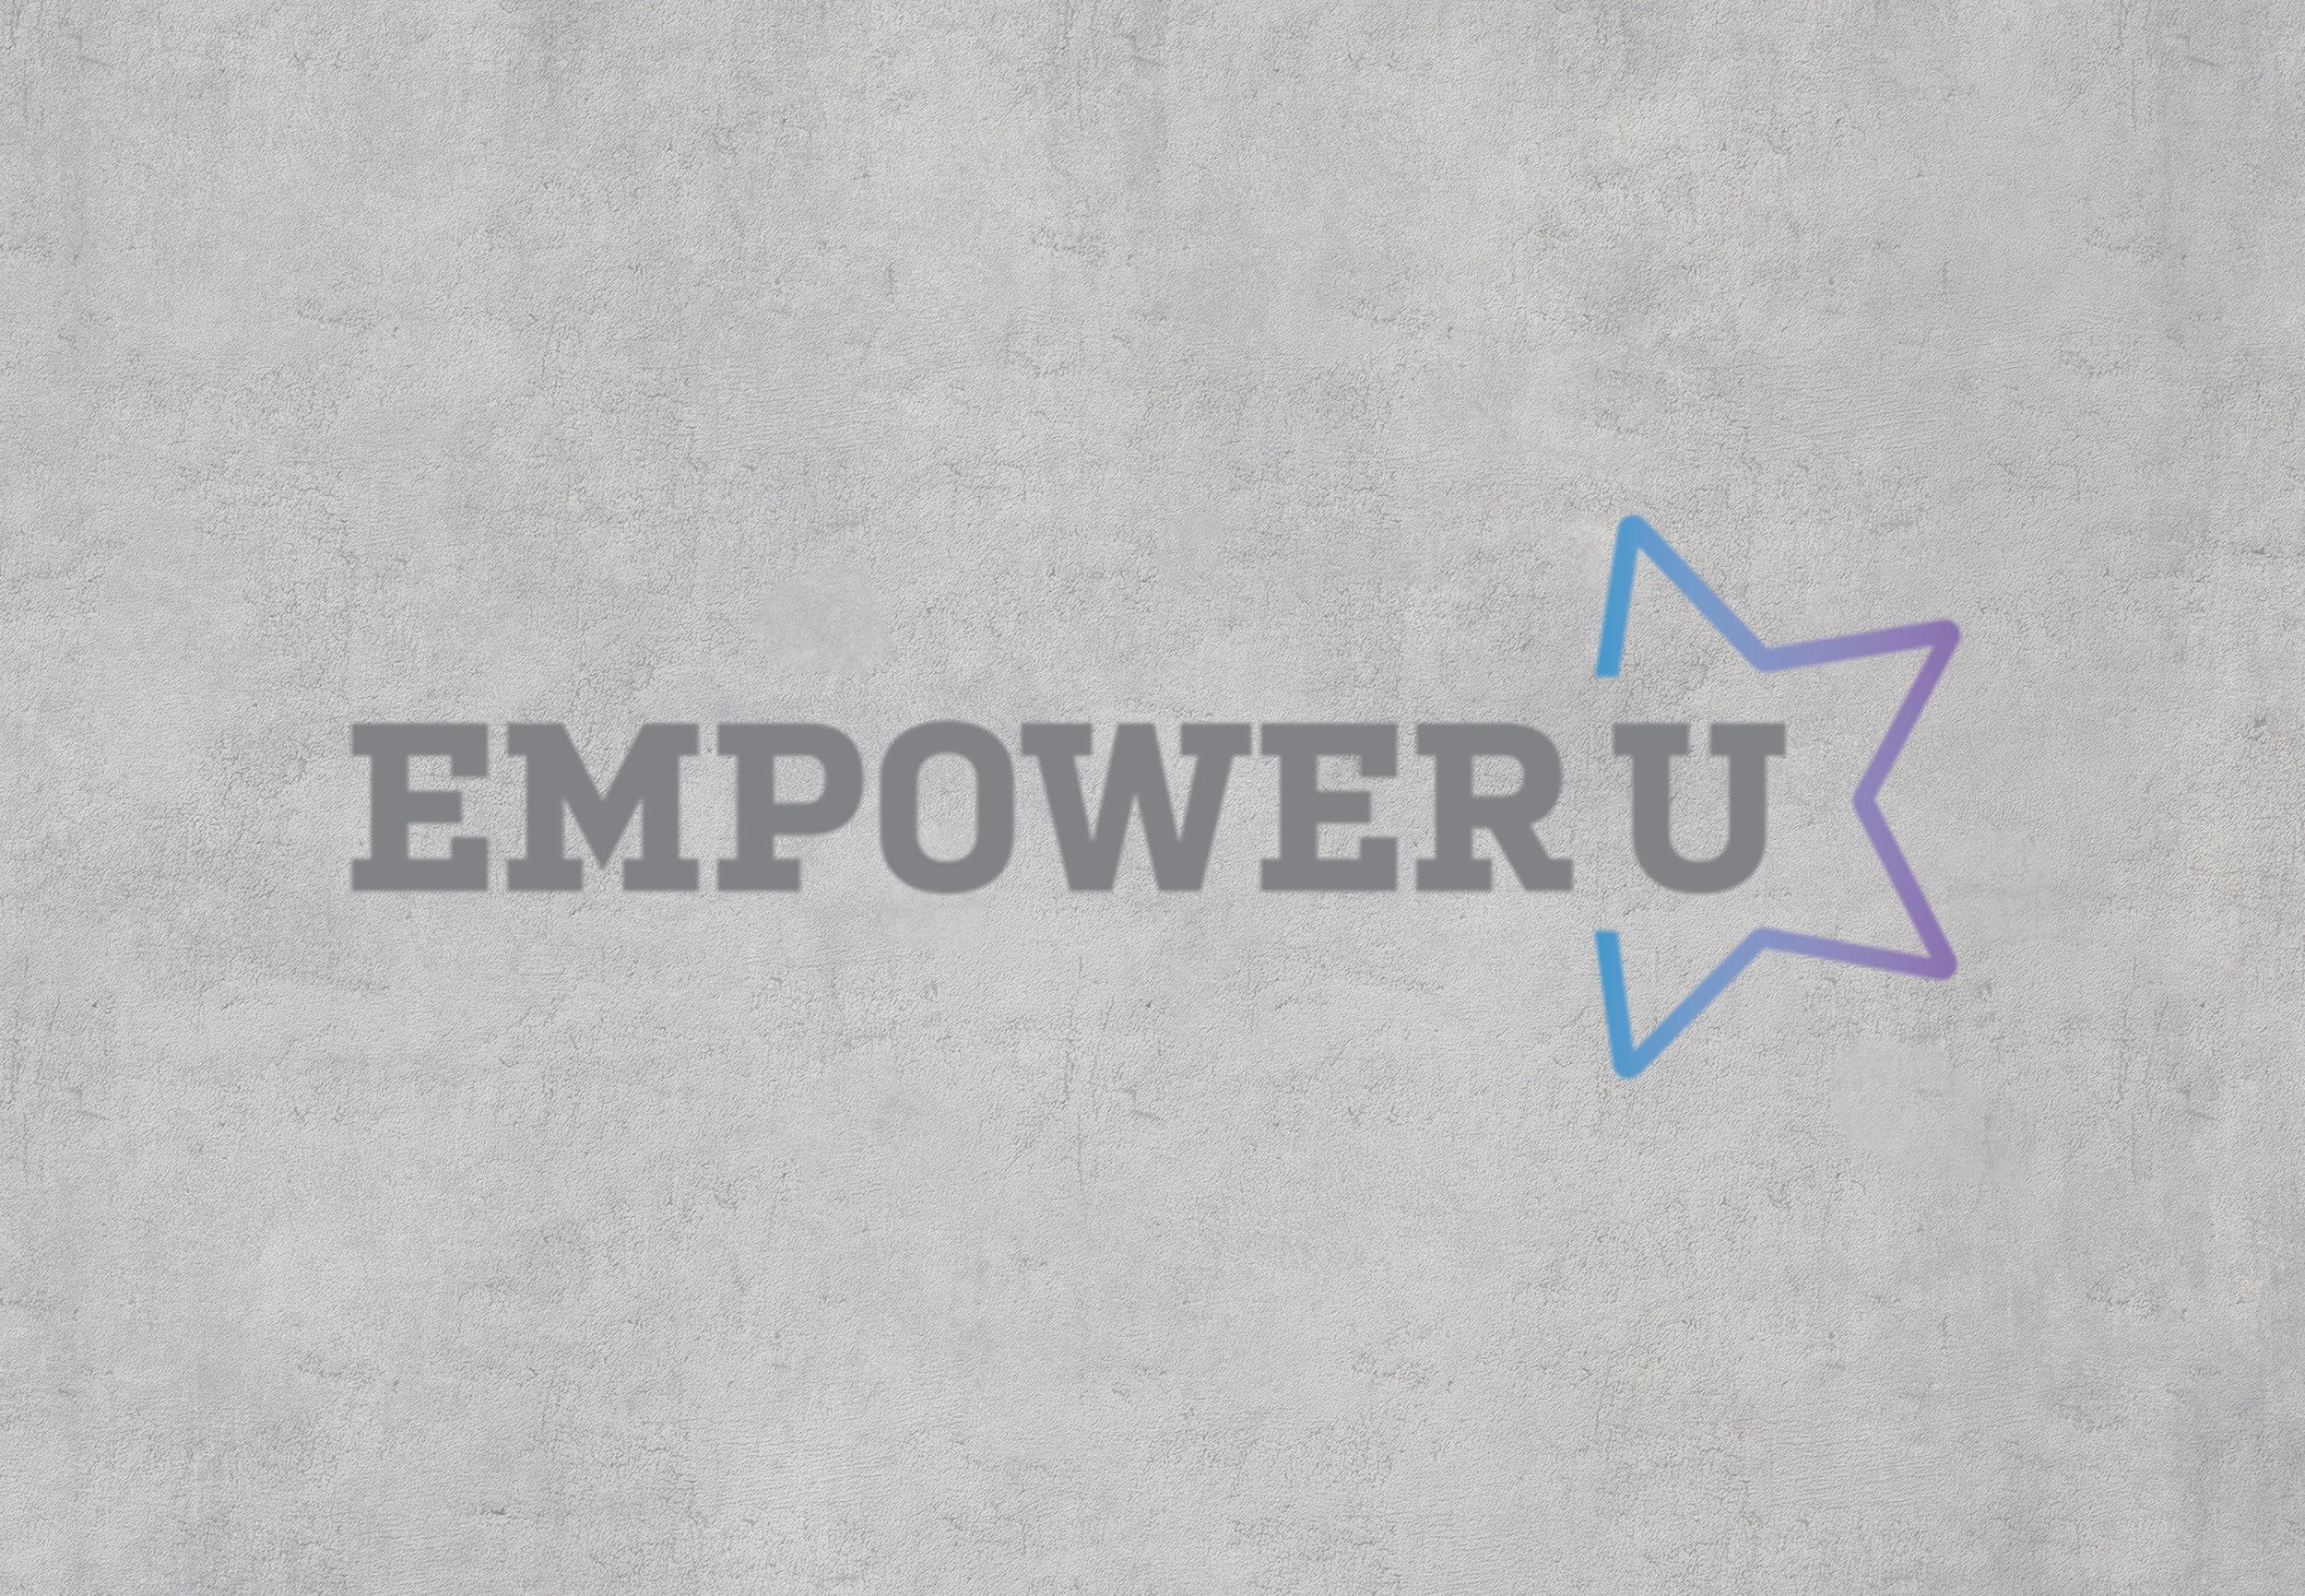 ScienceLogic EmpowerU Logo for Human Resources Department